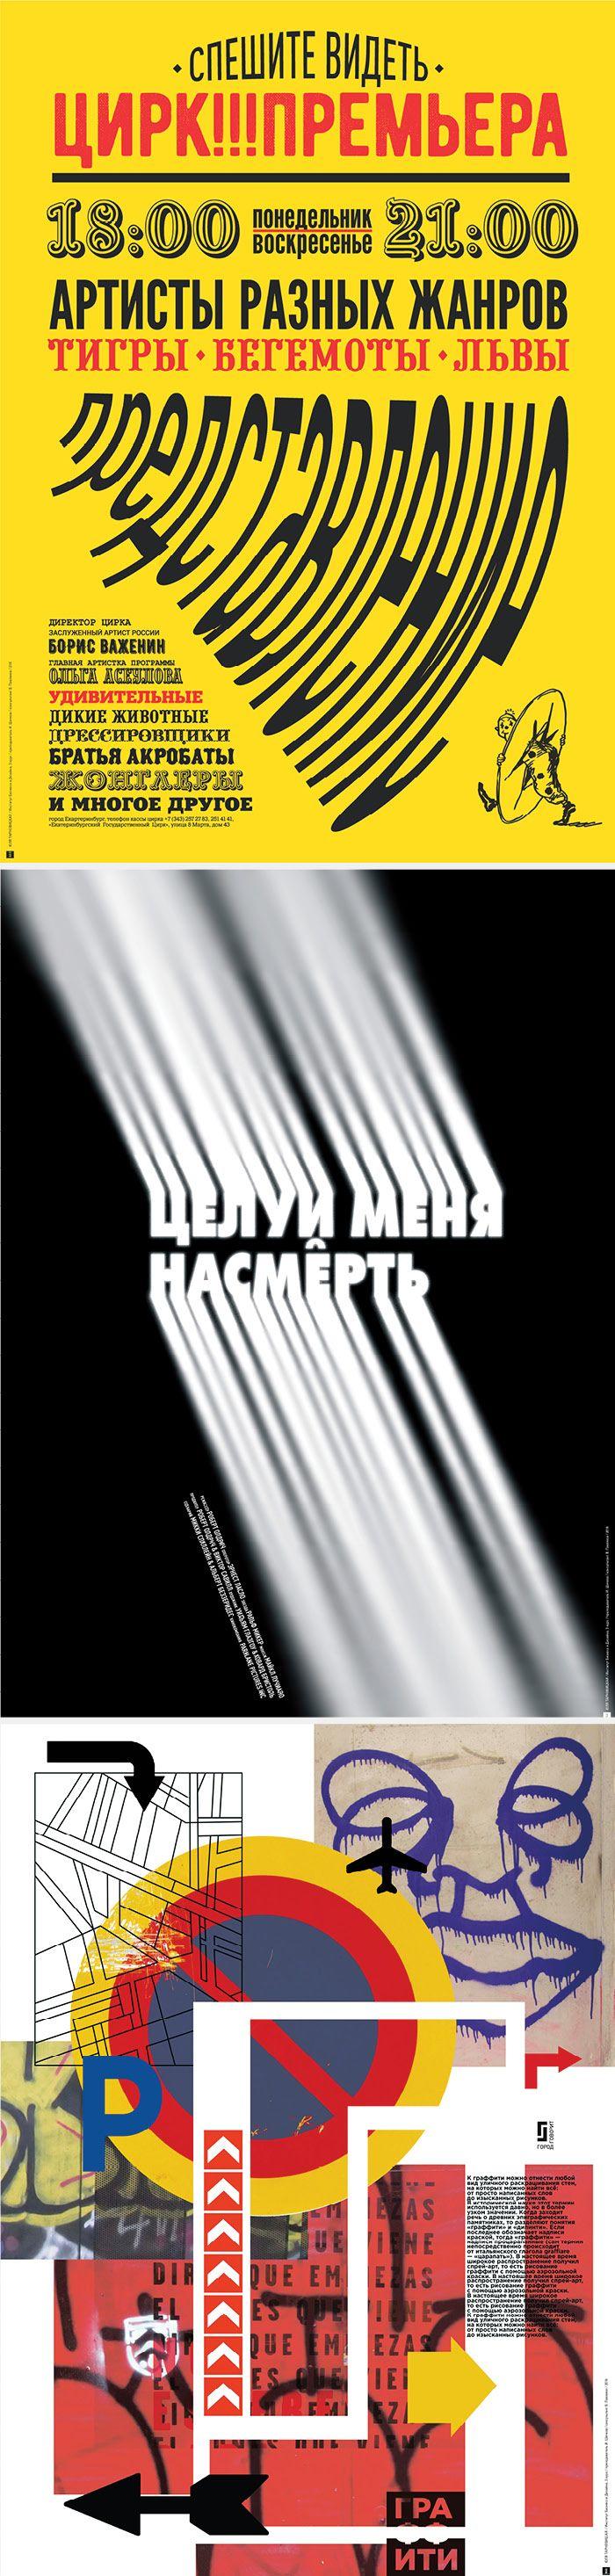 Типографика. Акциденция | 3 курс, студентка Тарновицкая Юлия | преподаватель Шичков И. Display typography | third year, student Yulia Tarnovitskaya | tutor Schichkov Igor